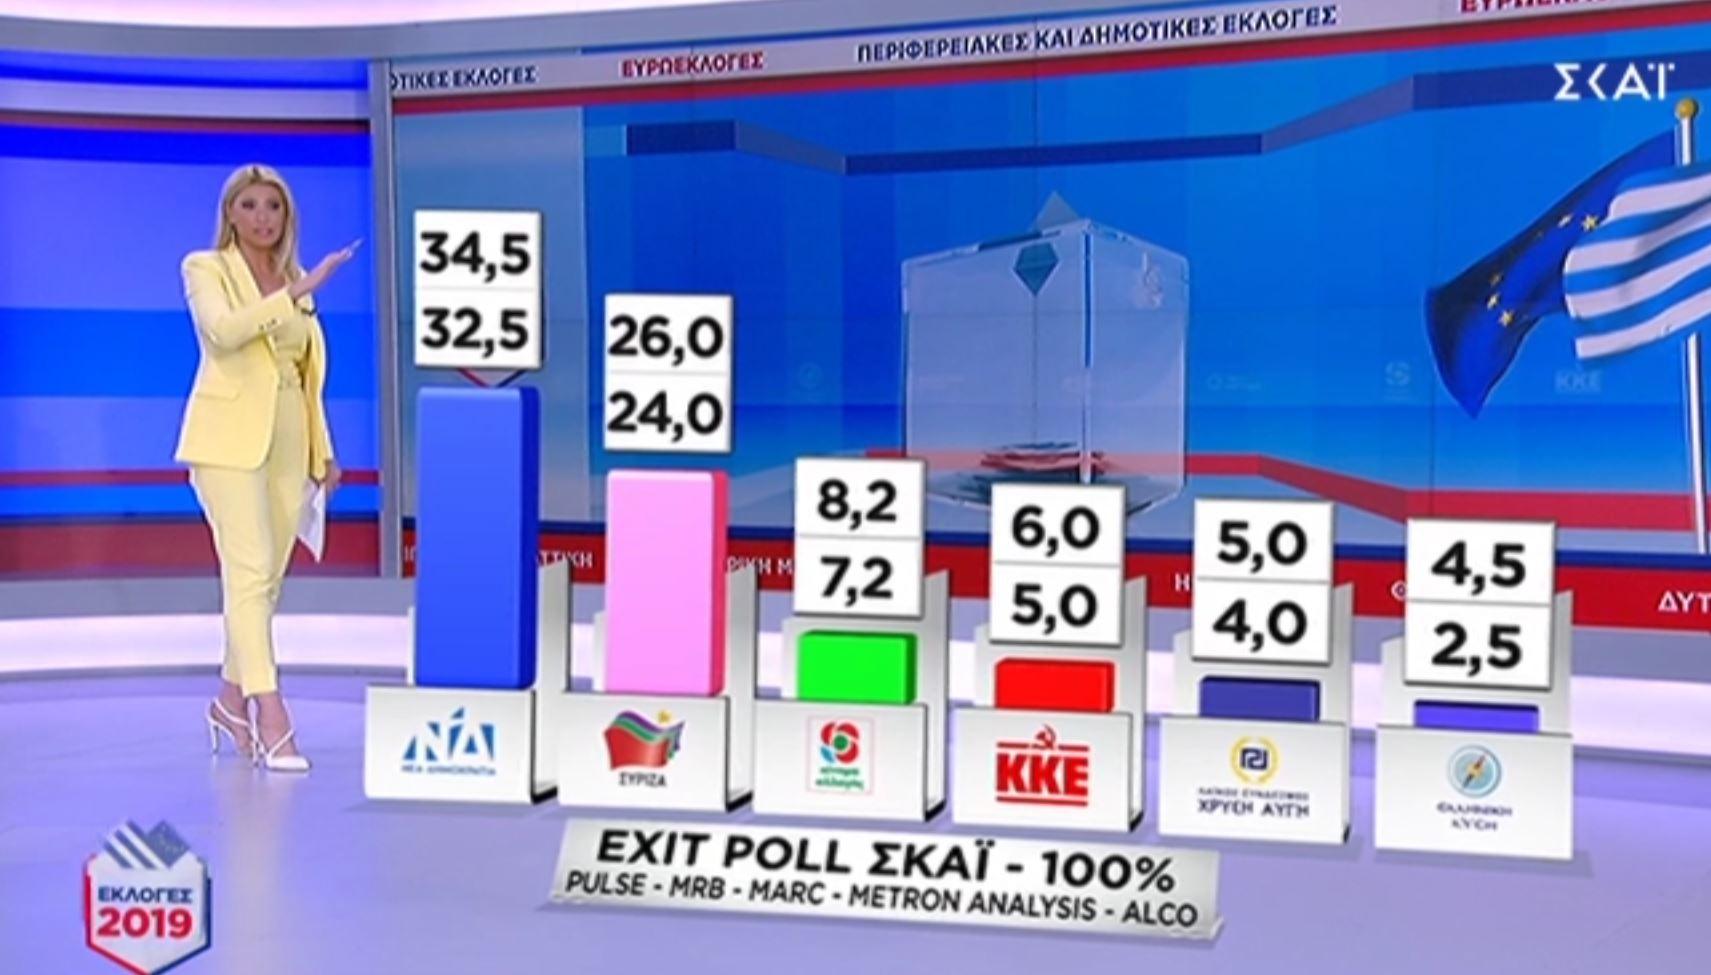 teliko Exit Poll: Προβάδισμα 8,5 μονάδων για τη ΝΔ έναντι του ΣΥΡΙΖΑ